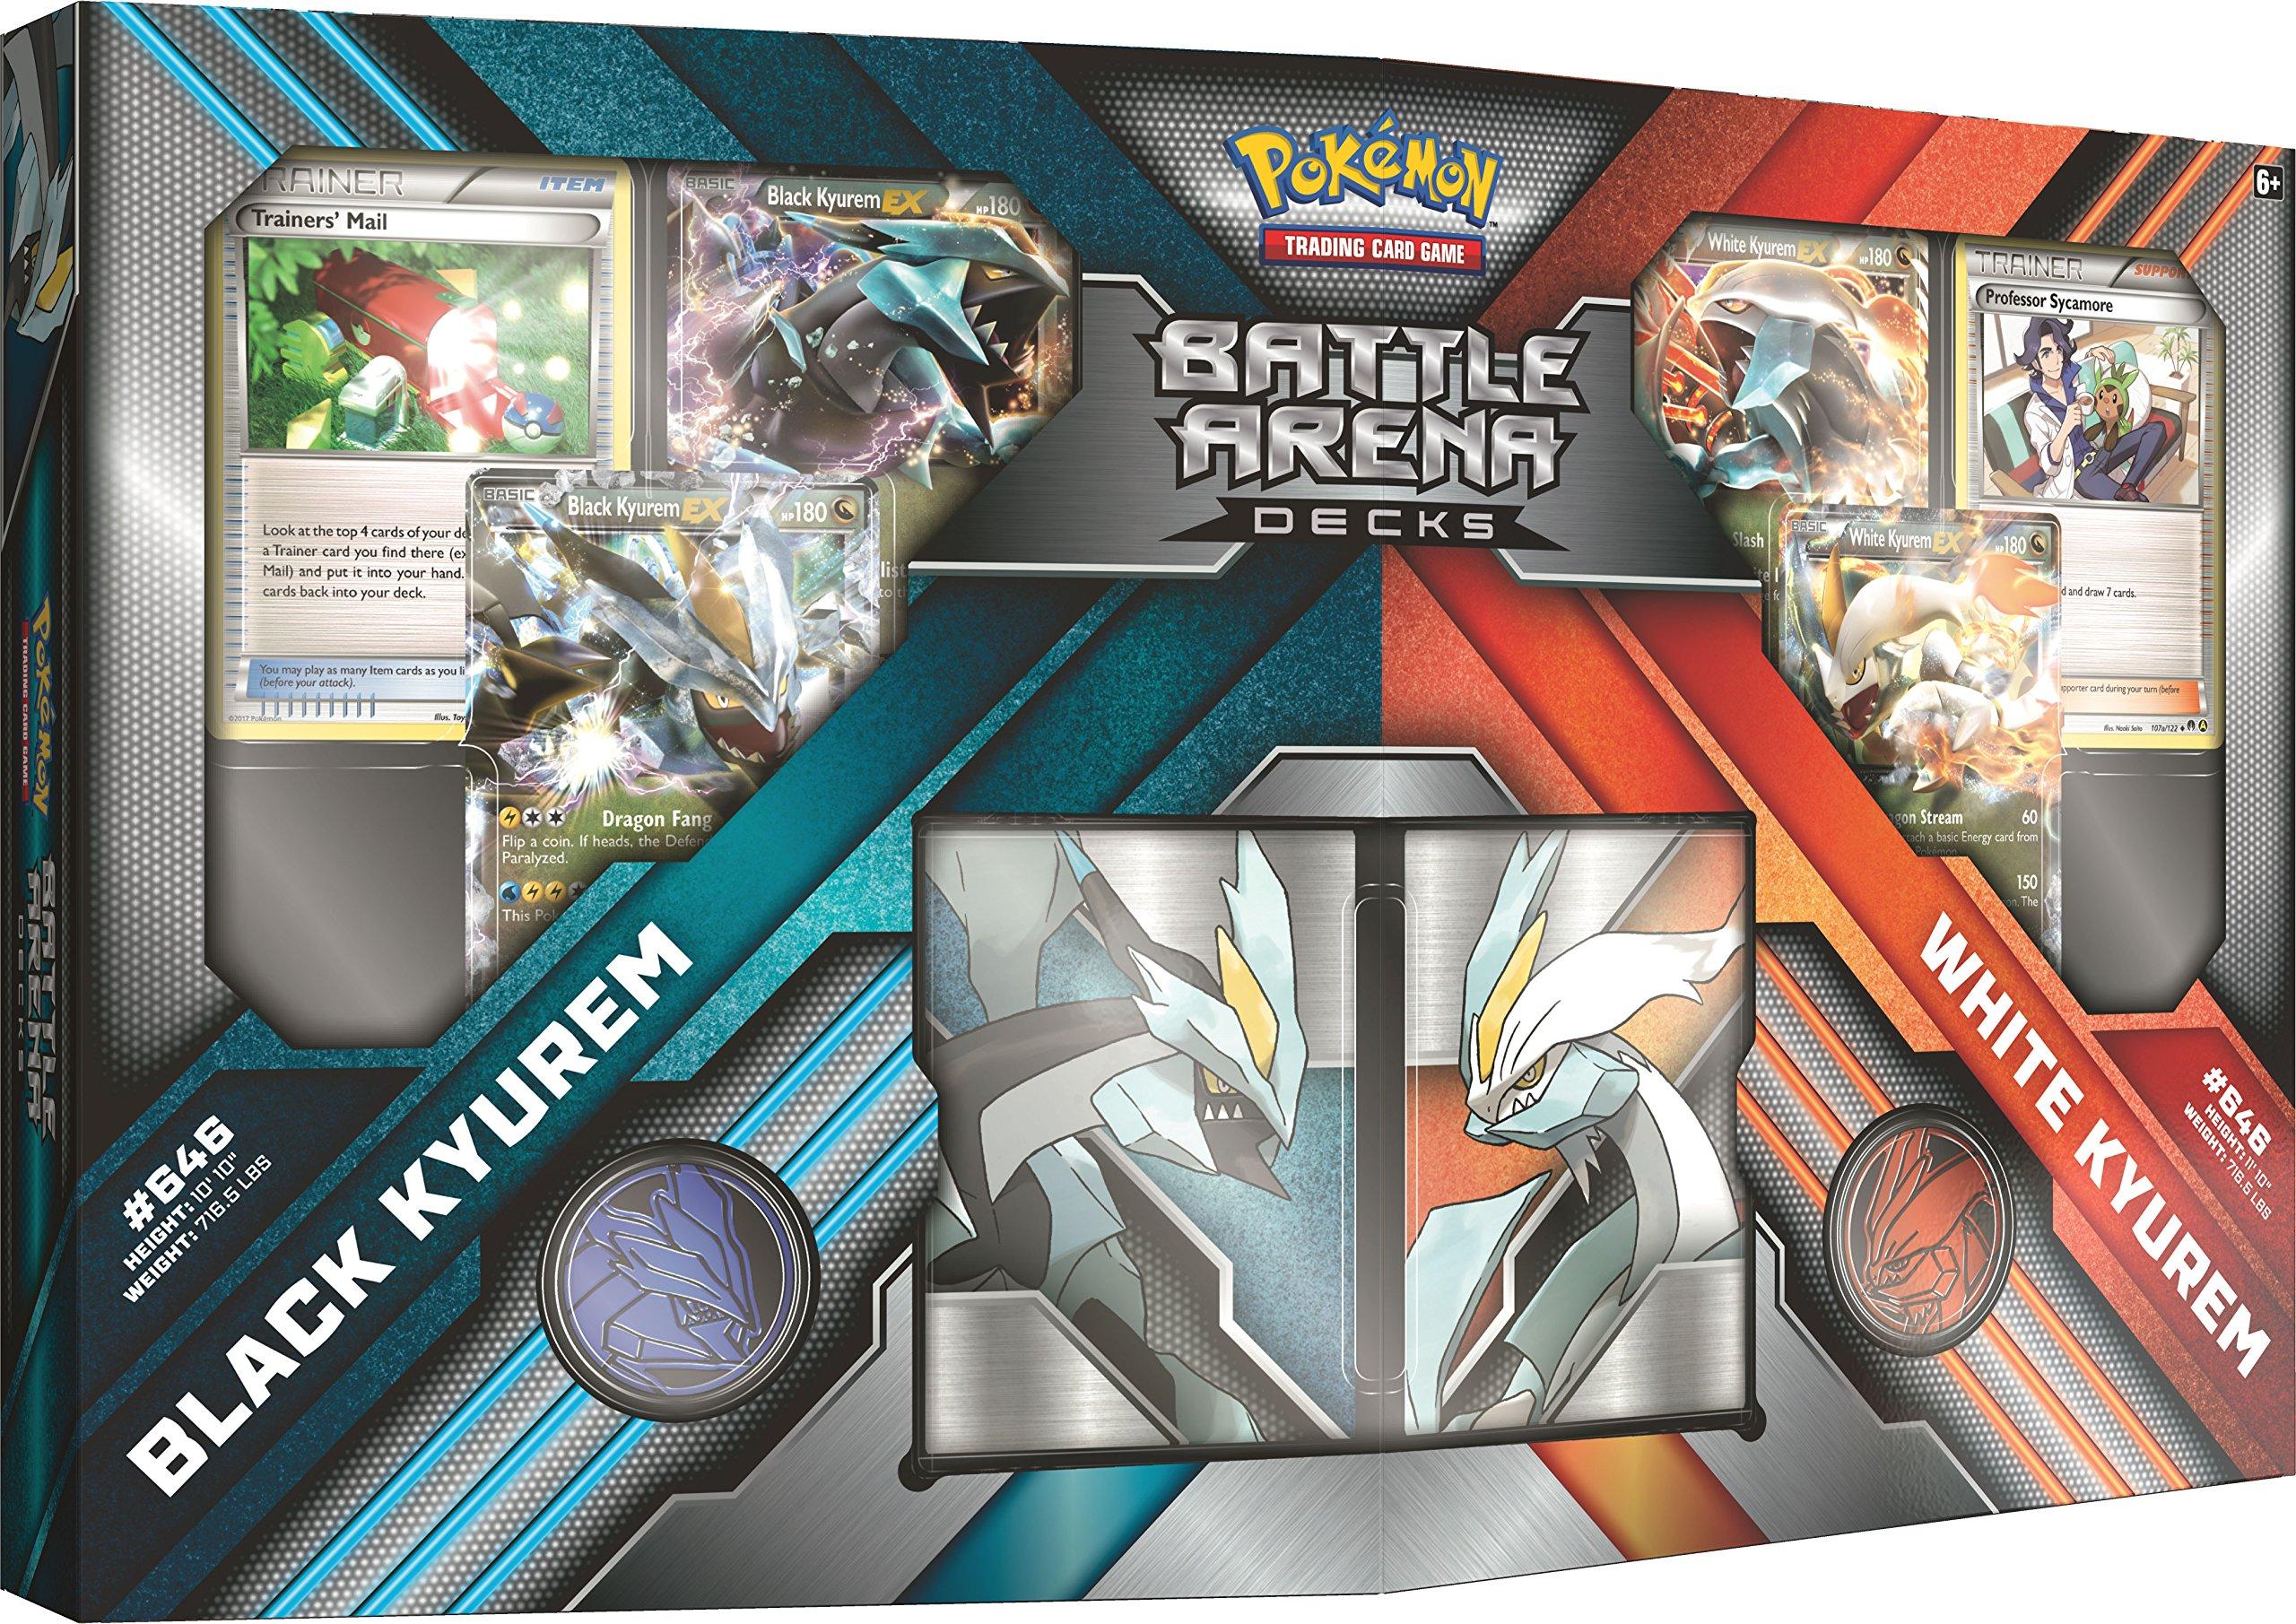 Pokemon TCG Battle Arena Decks Black Kyuremvs. White Kyurem Card Game